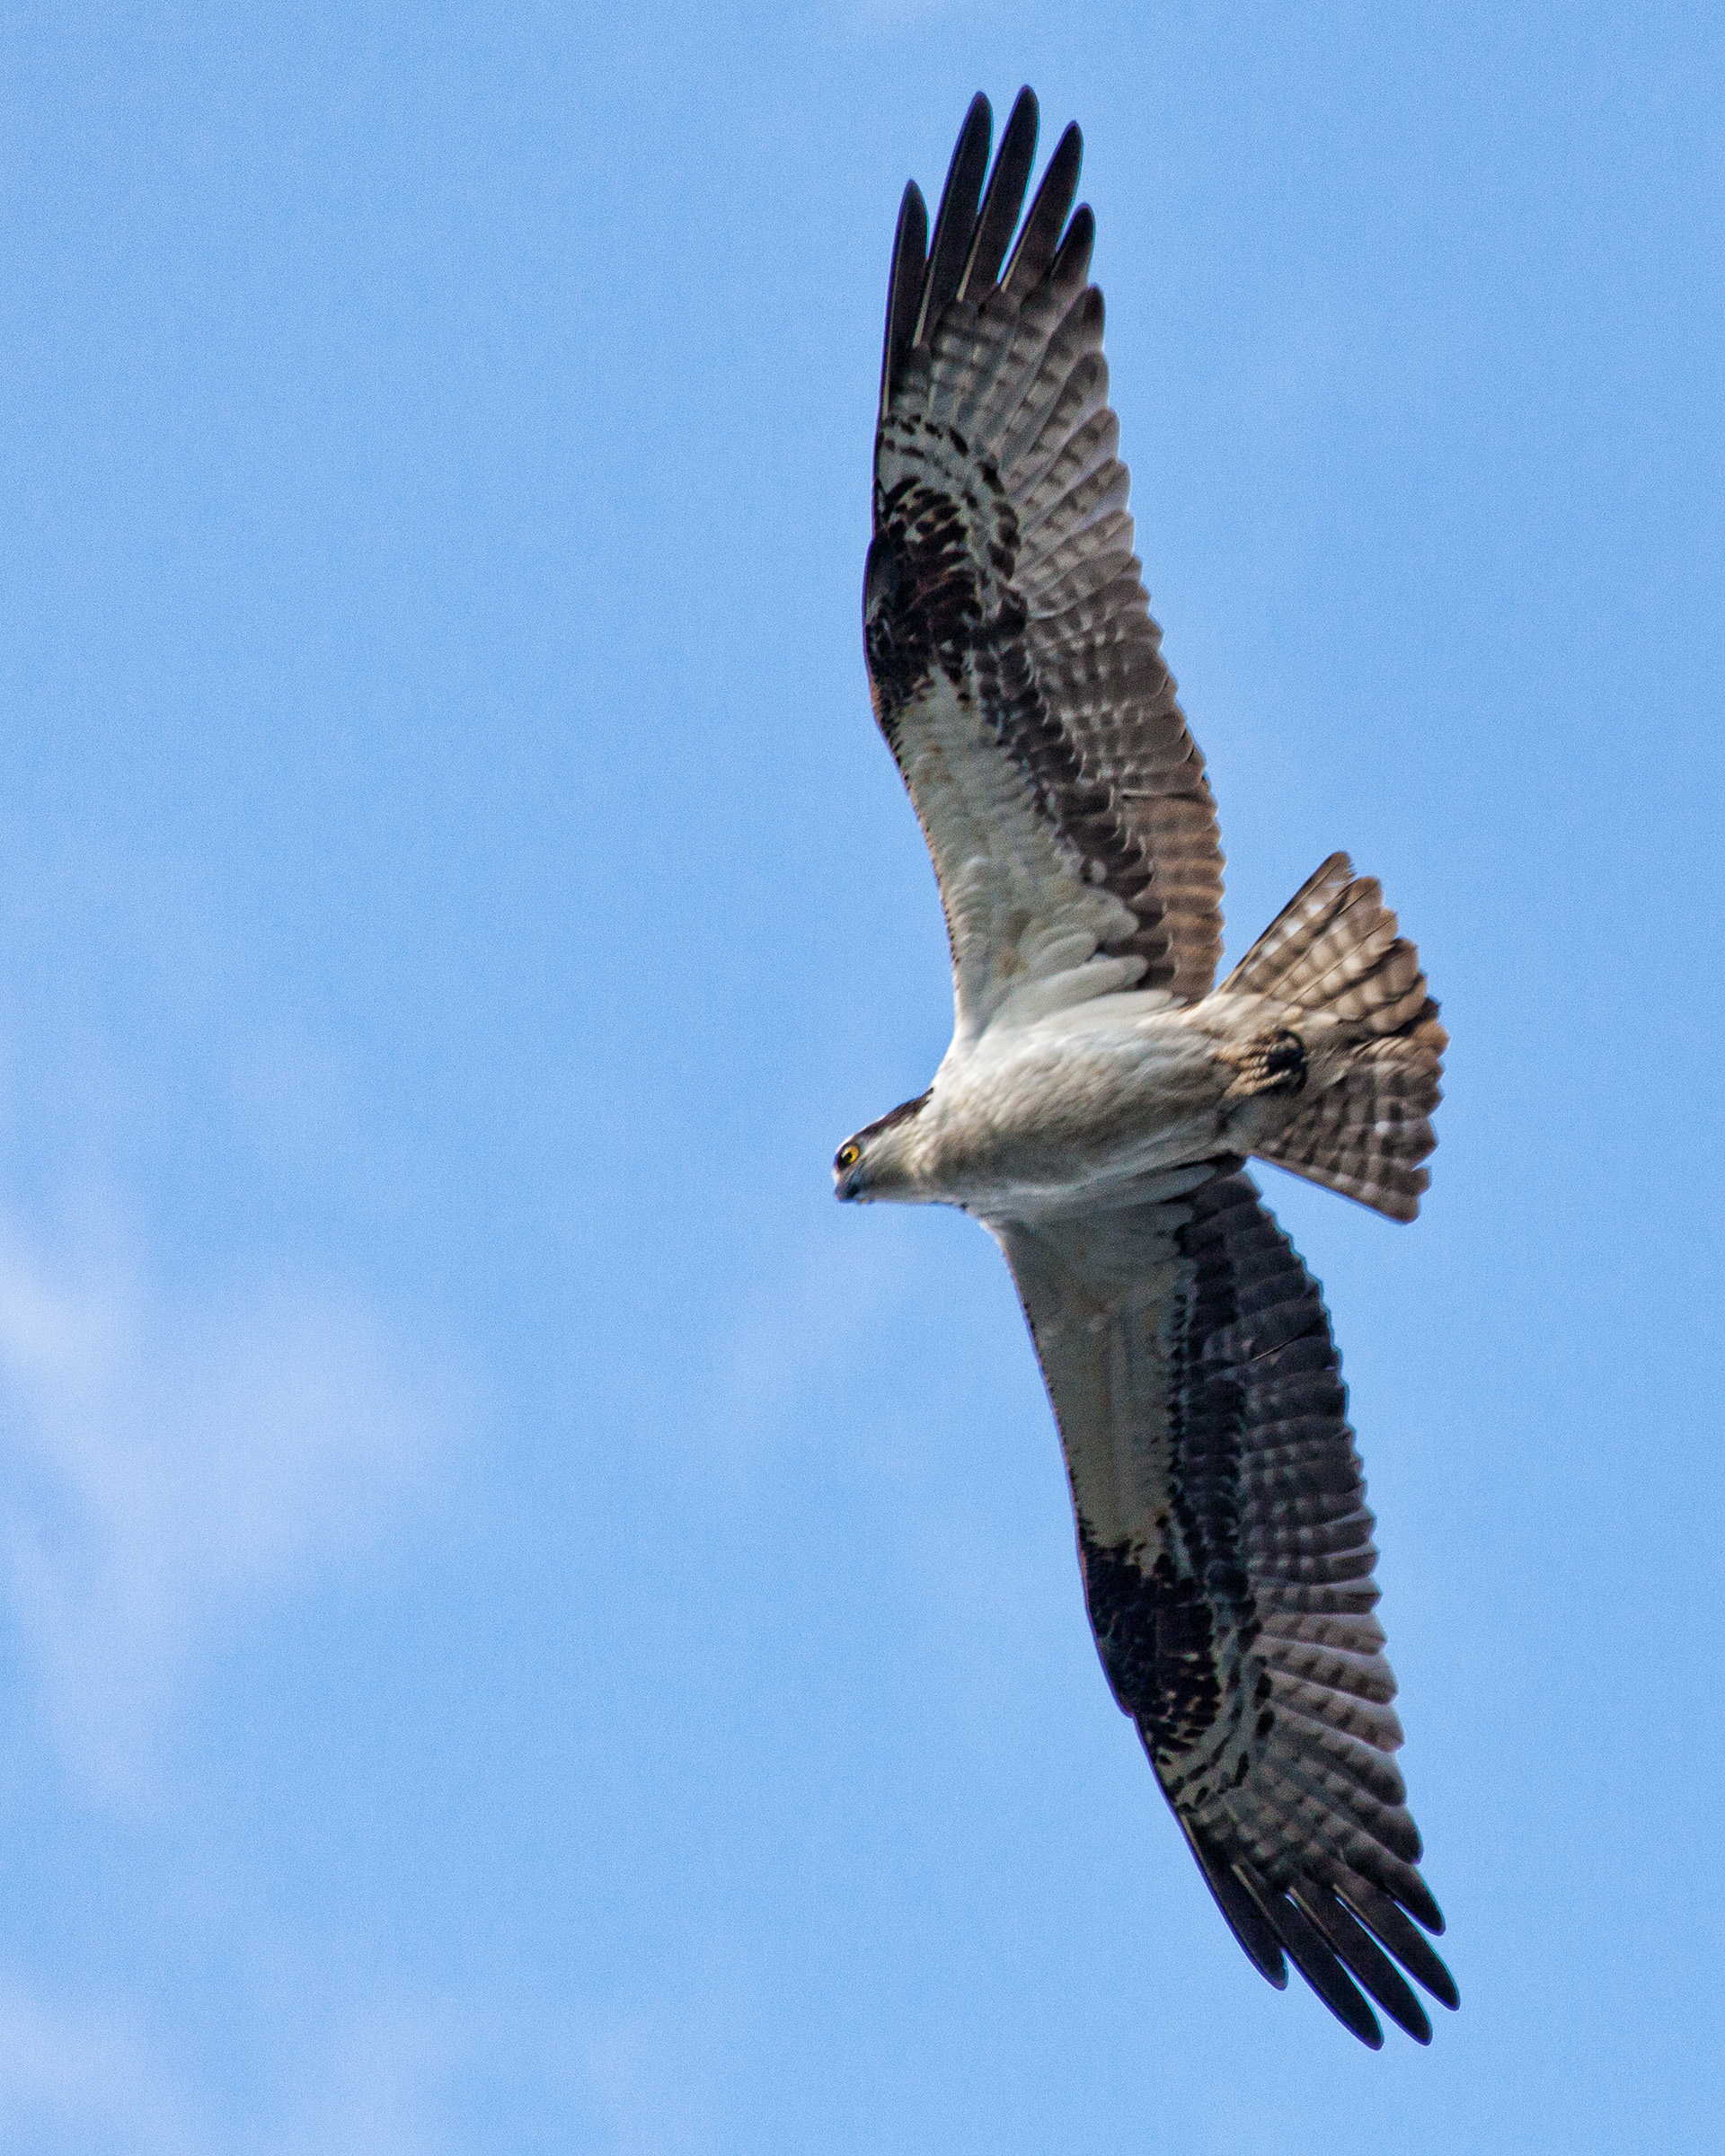 Osprey, Animal, Pandion, Holding, Hunter, HQ Photo